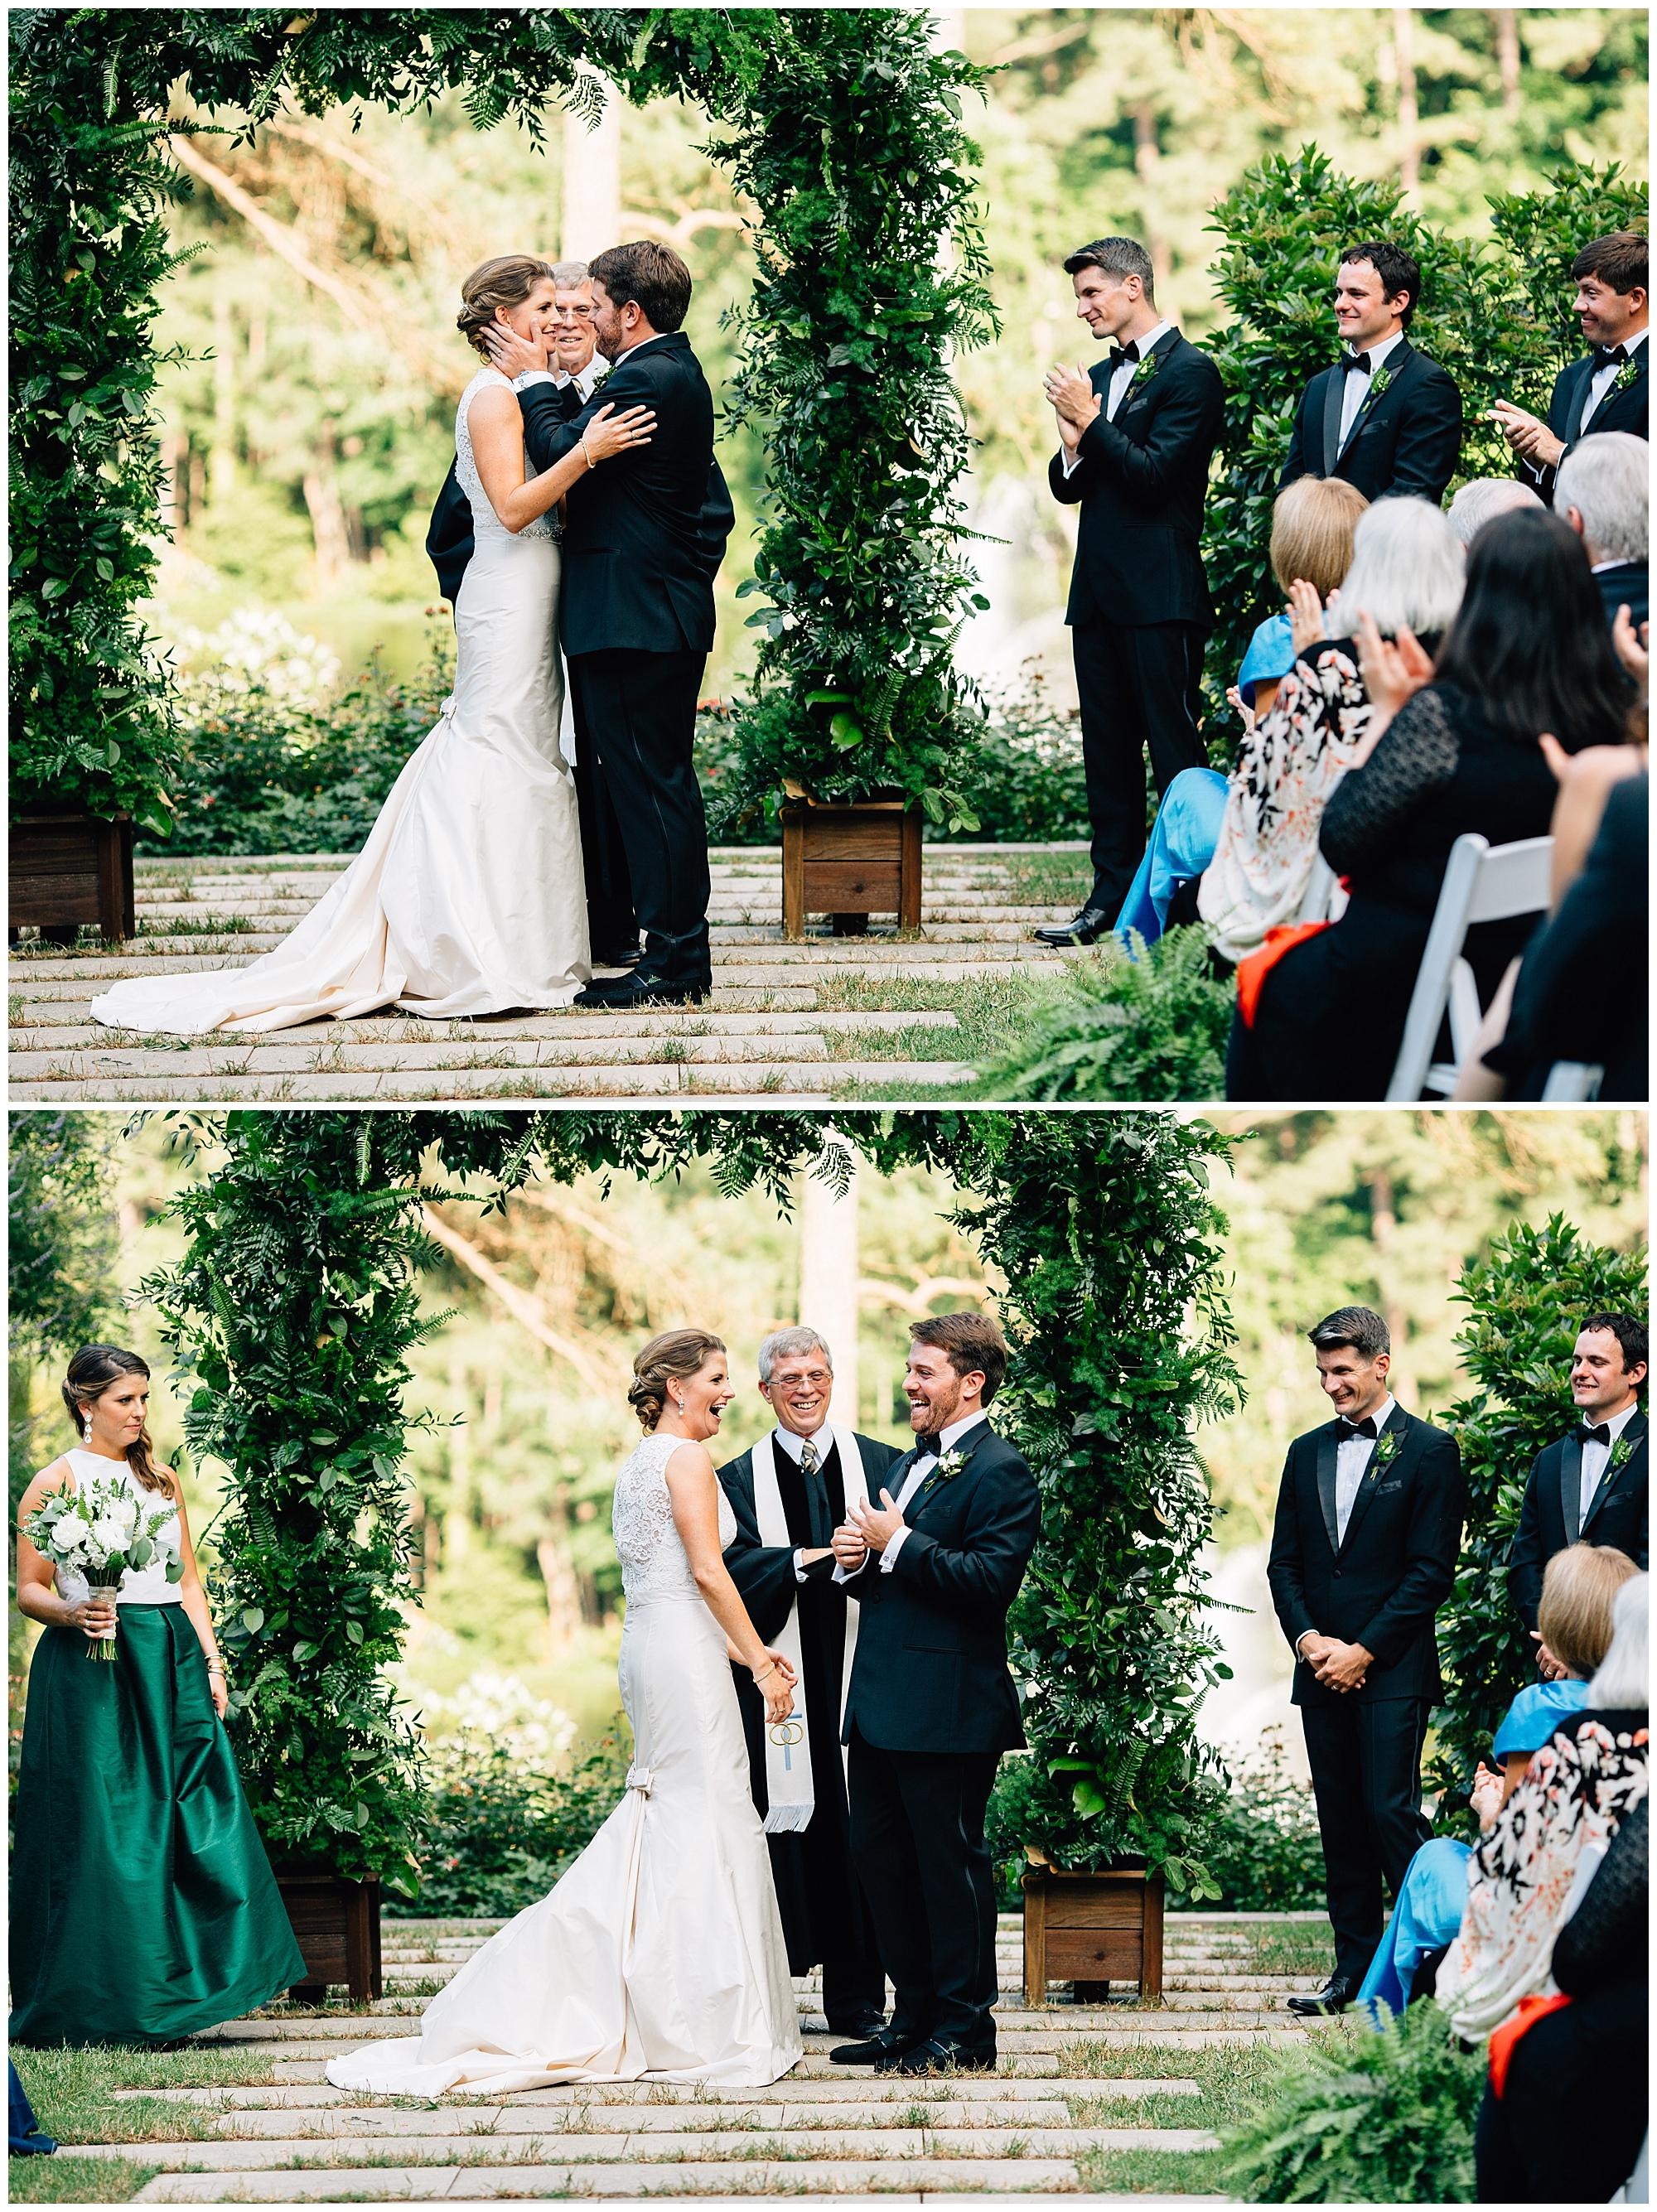 Umstead-wedding-photographer_0108.jpg